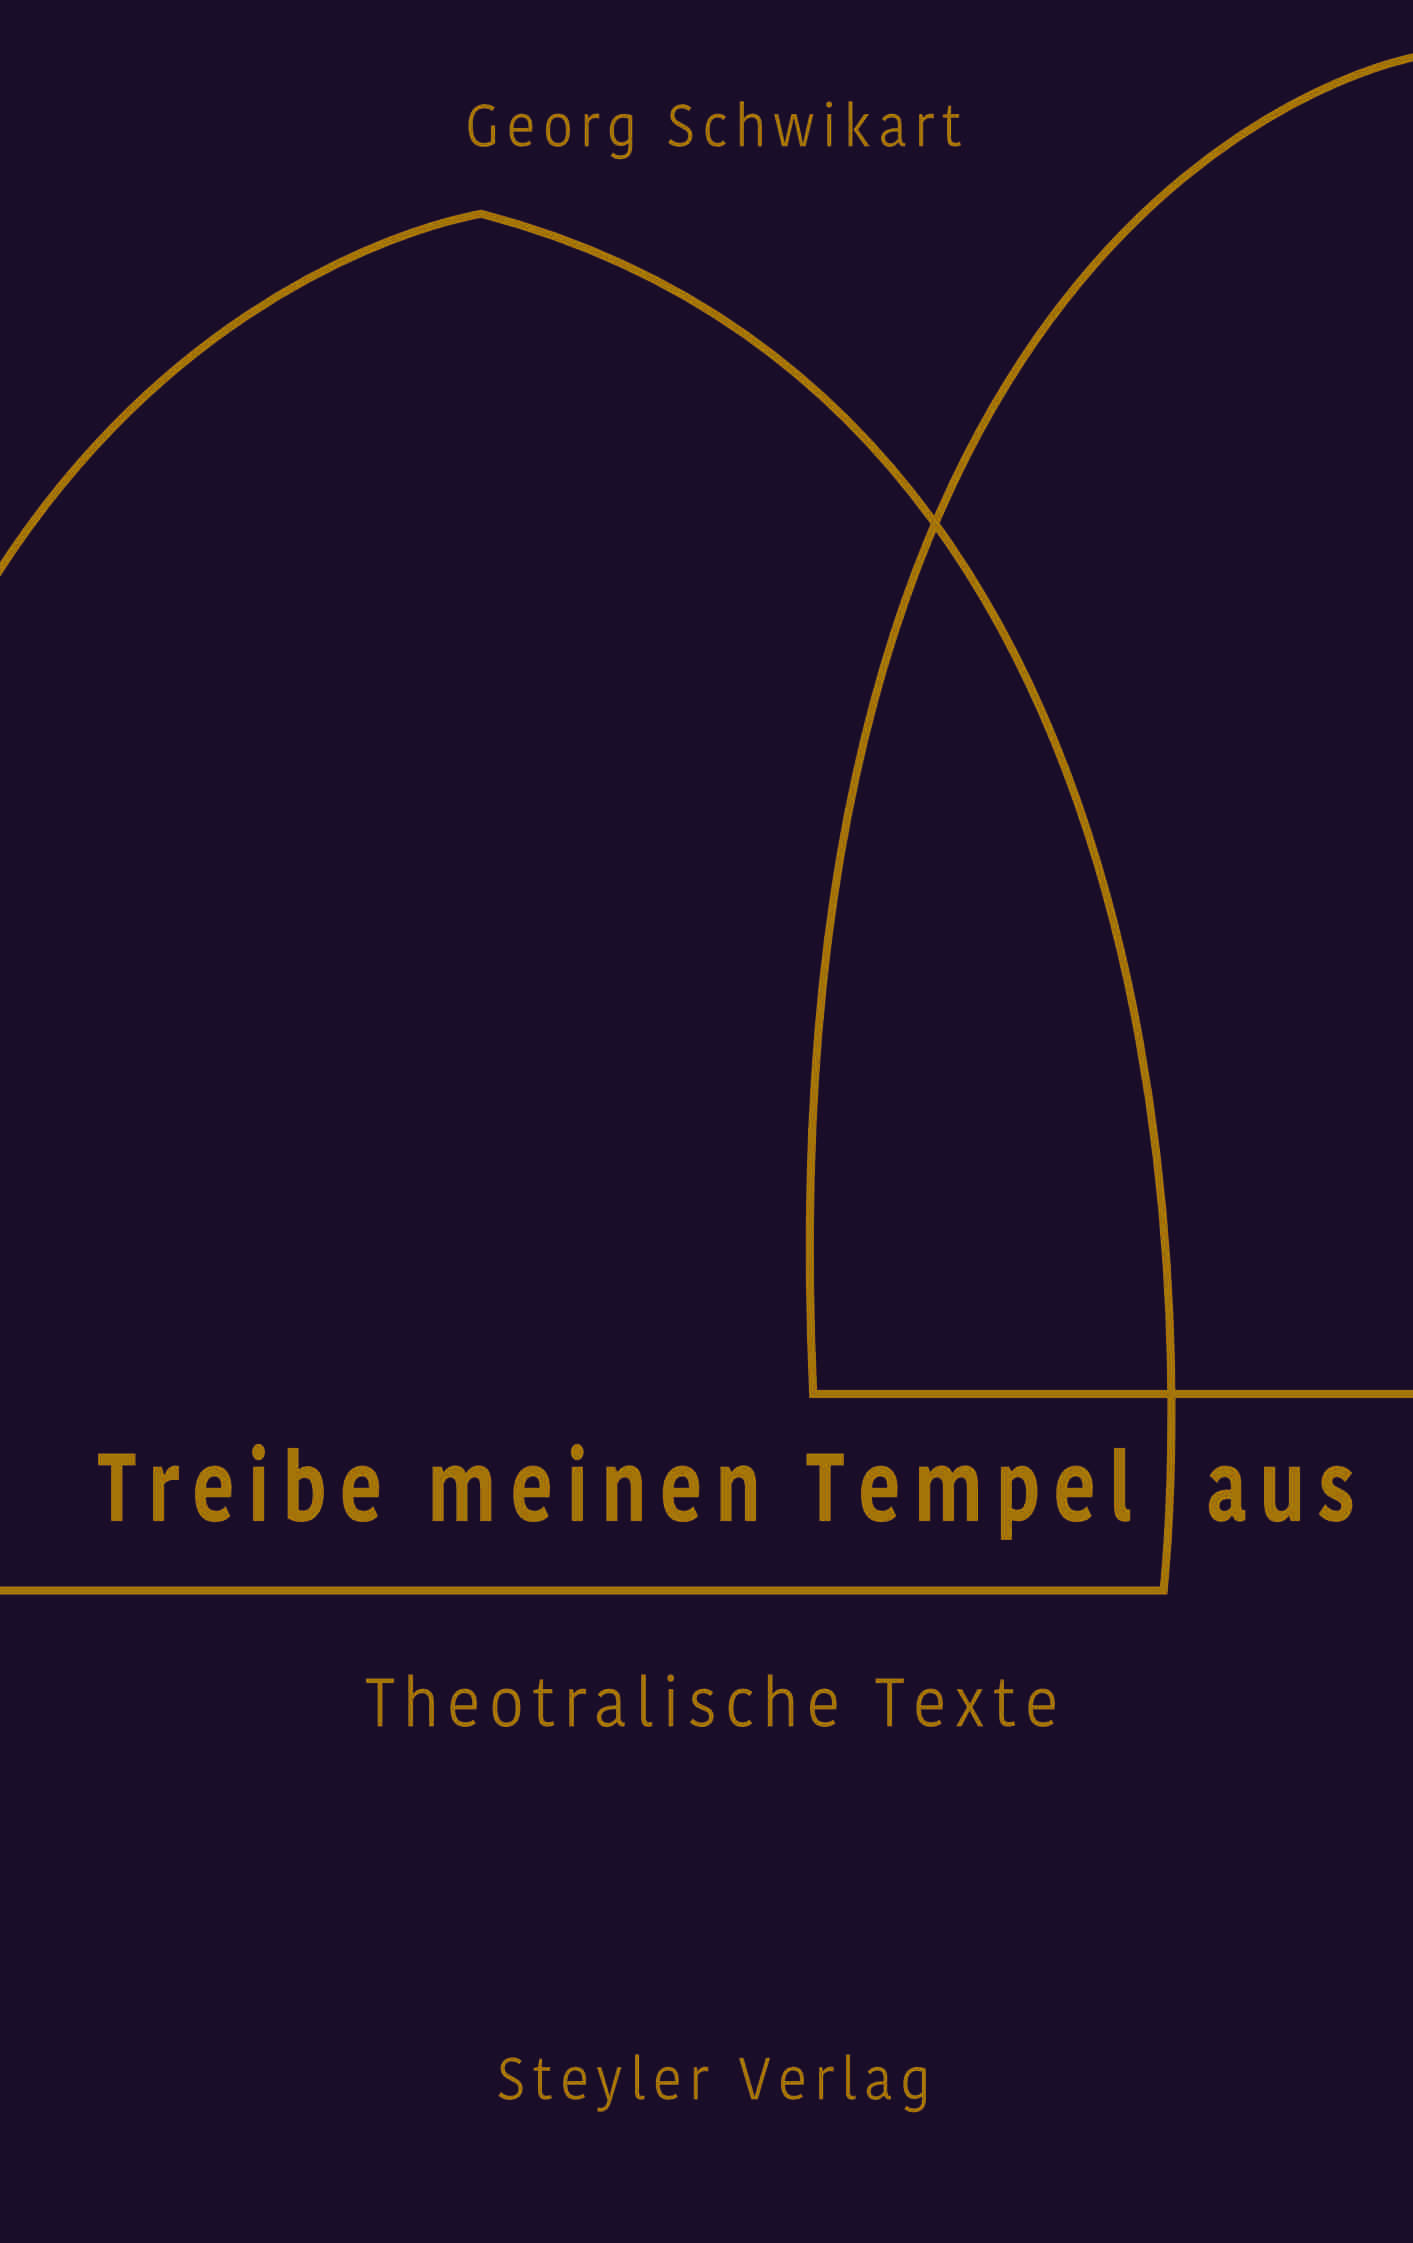 Violettes Buchcover mit goldenem Titel